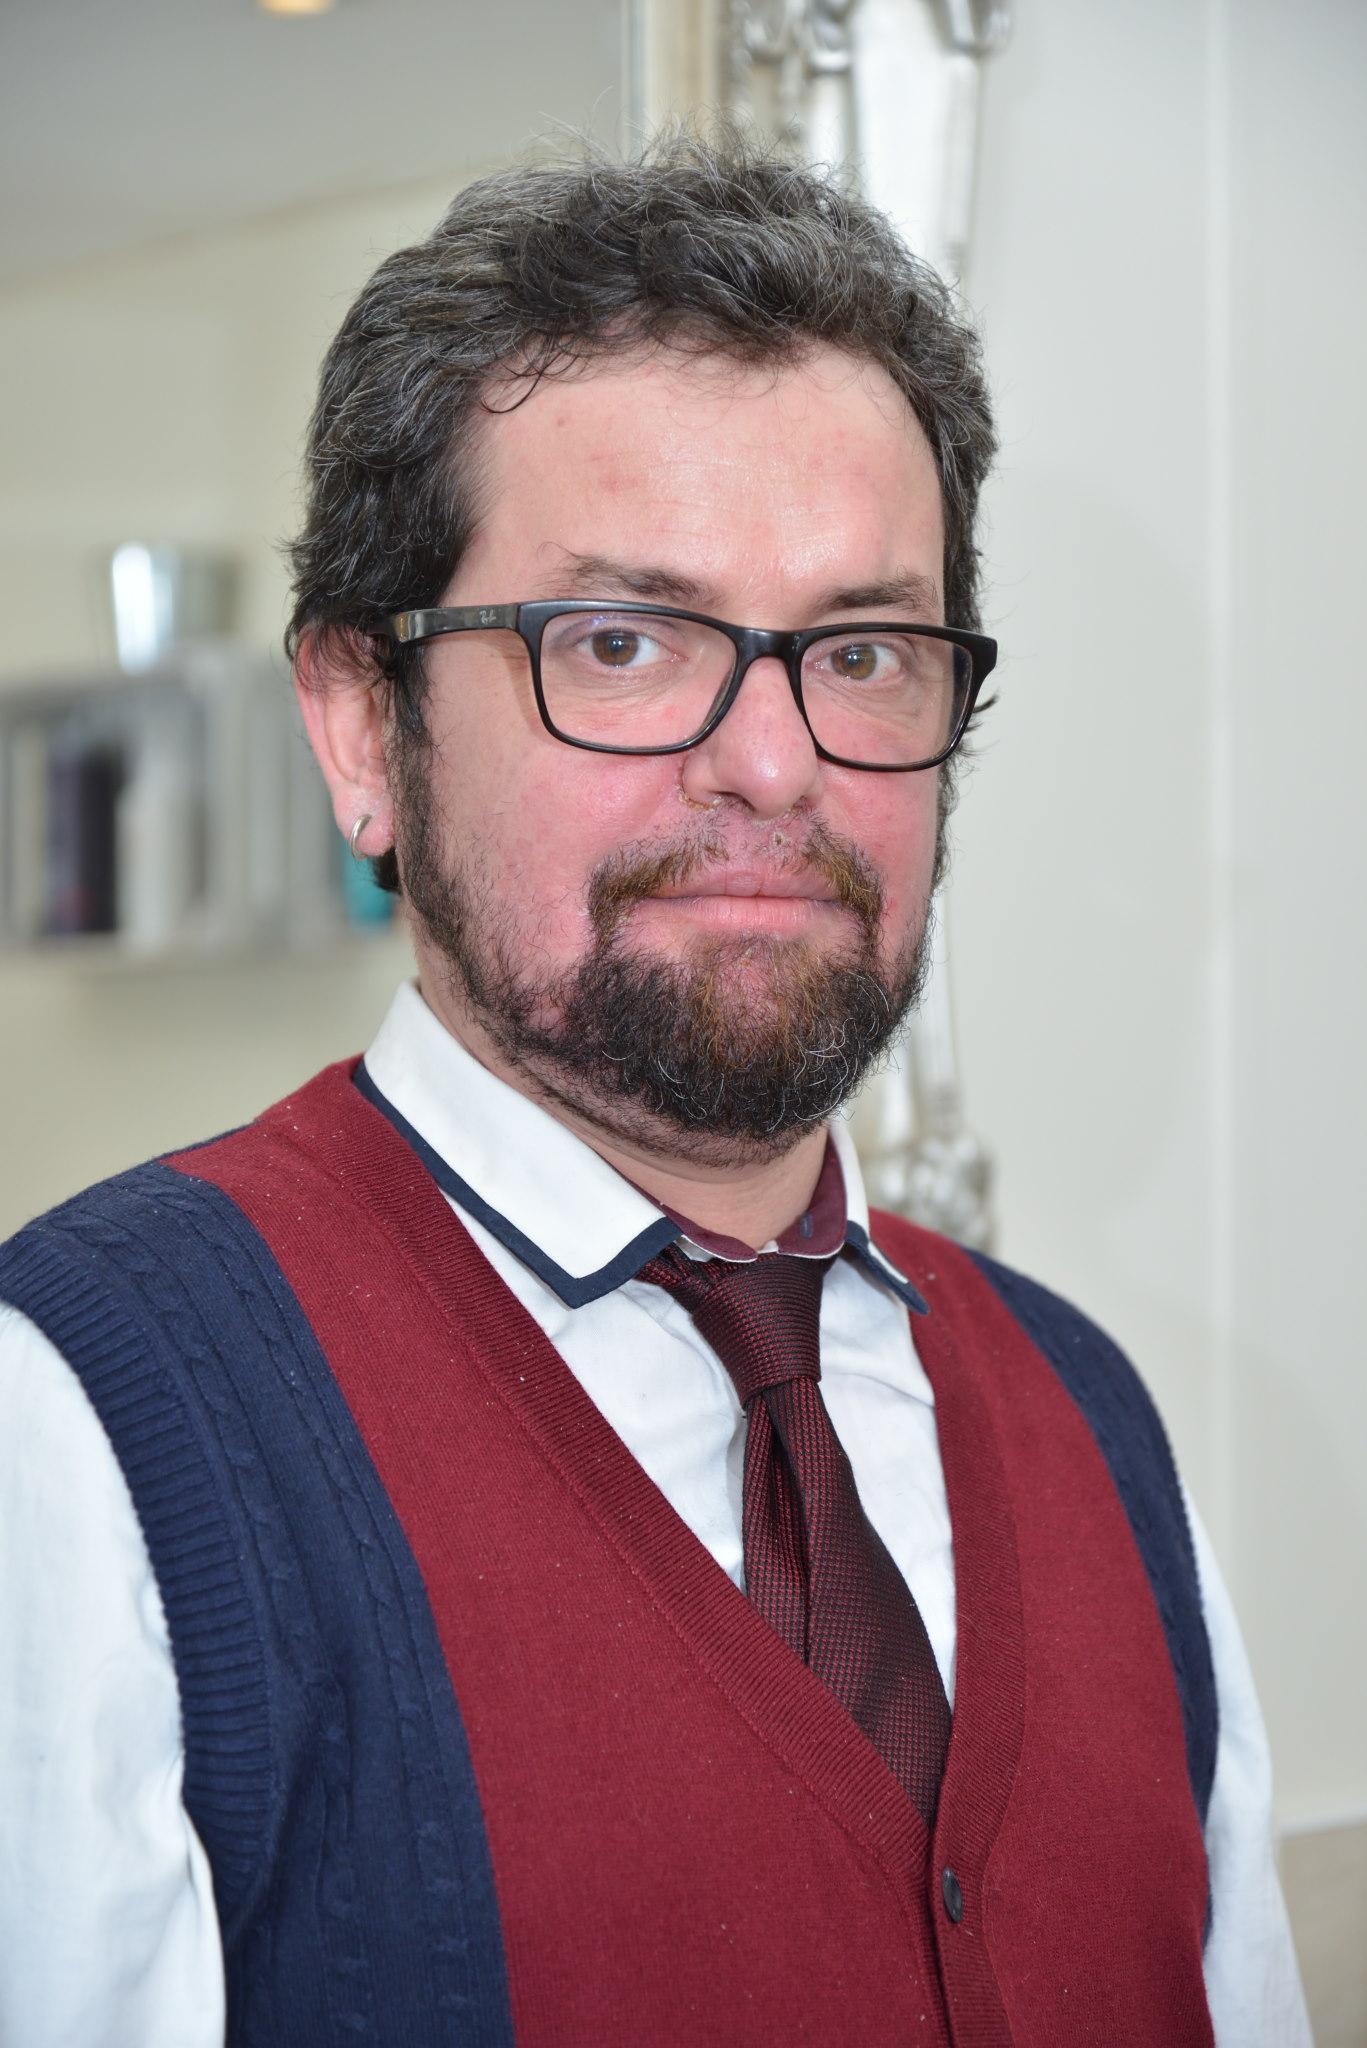 James, Artistic Director, Radlett salon